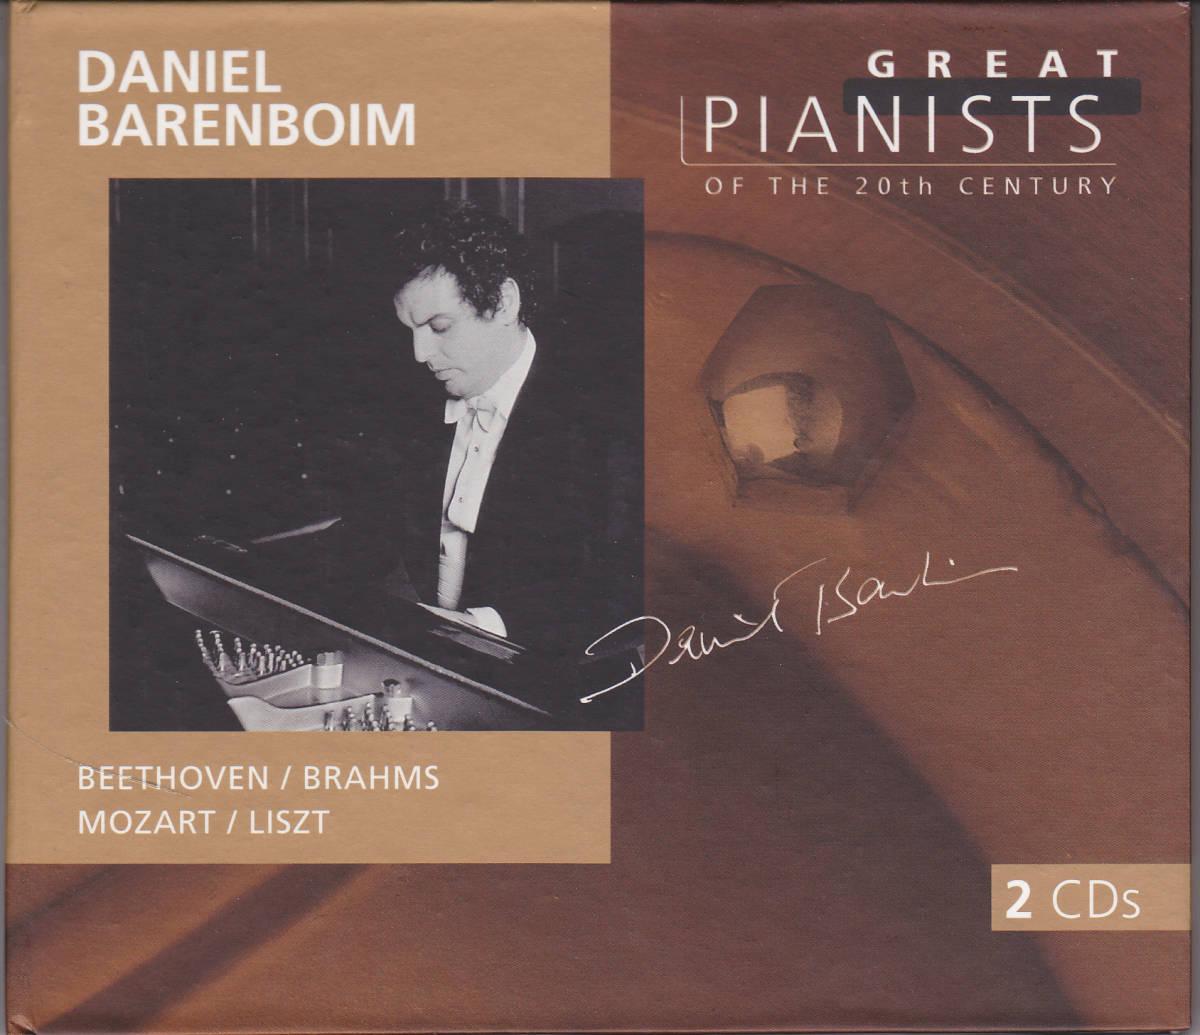 Daniel Barenboim / Great Pianists of the 20th Century 2CD